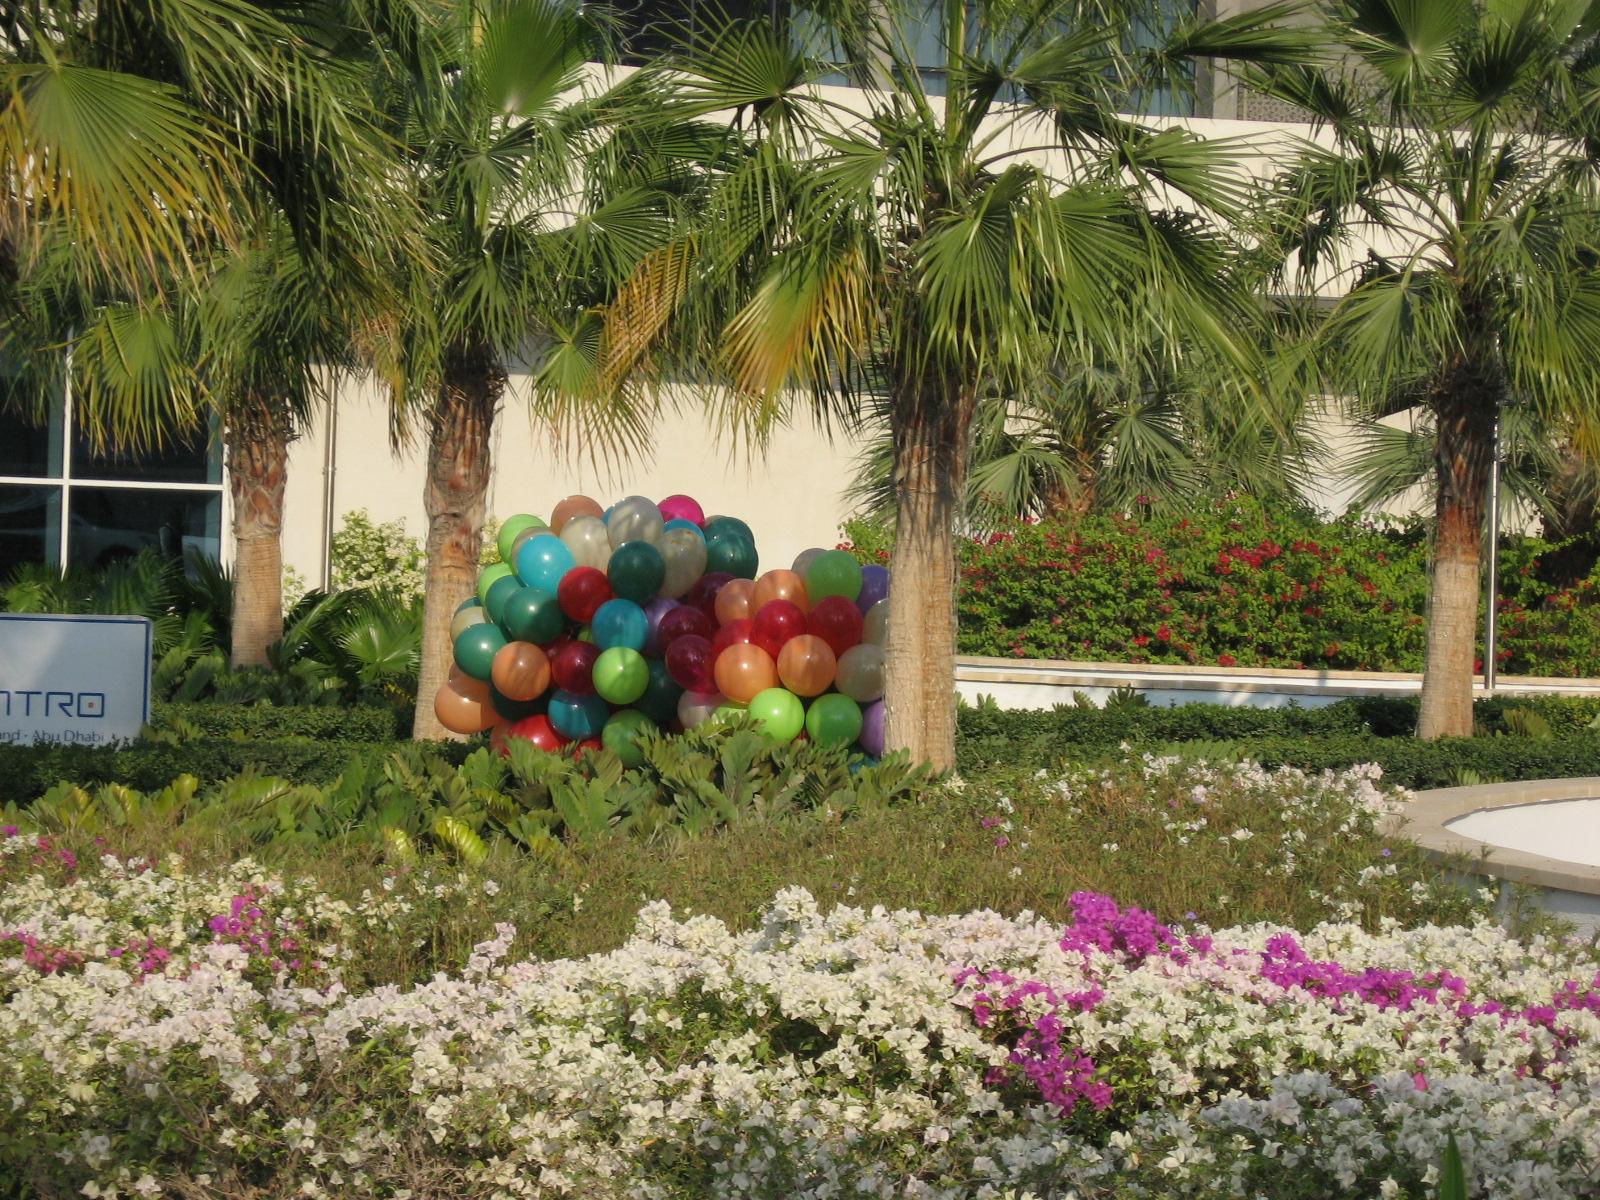 Abu Dhabi - Laufende Luftballons - Silvestervorbereitungen im Yas Island Rotana Centro Hotel